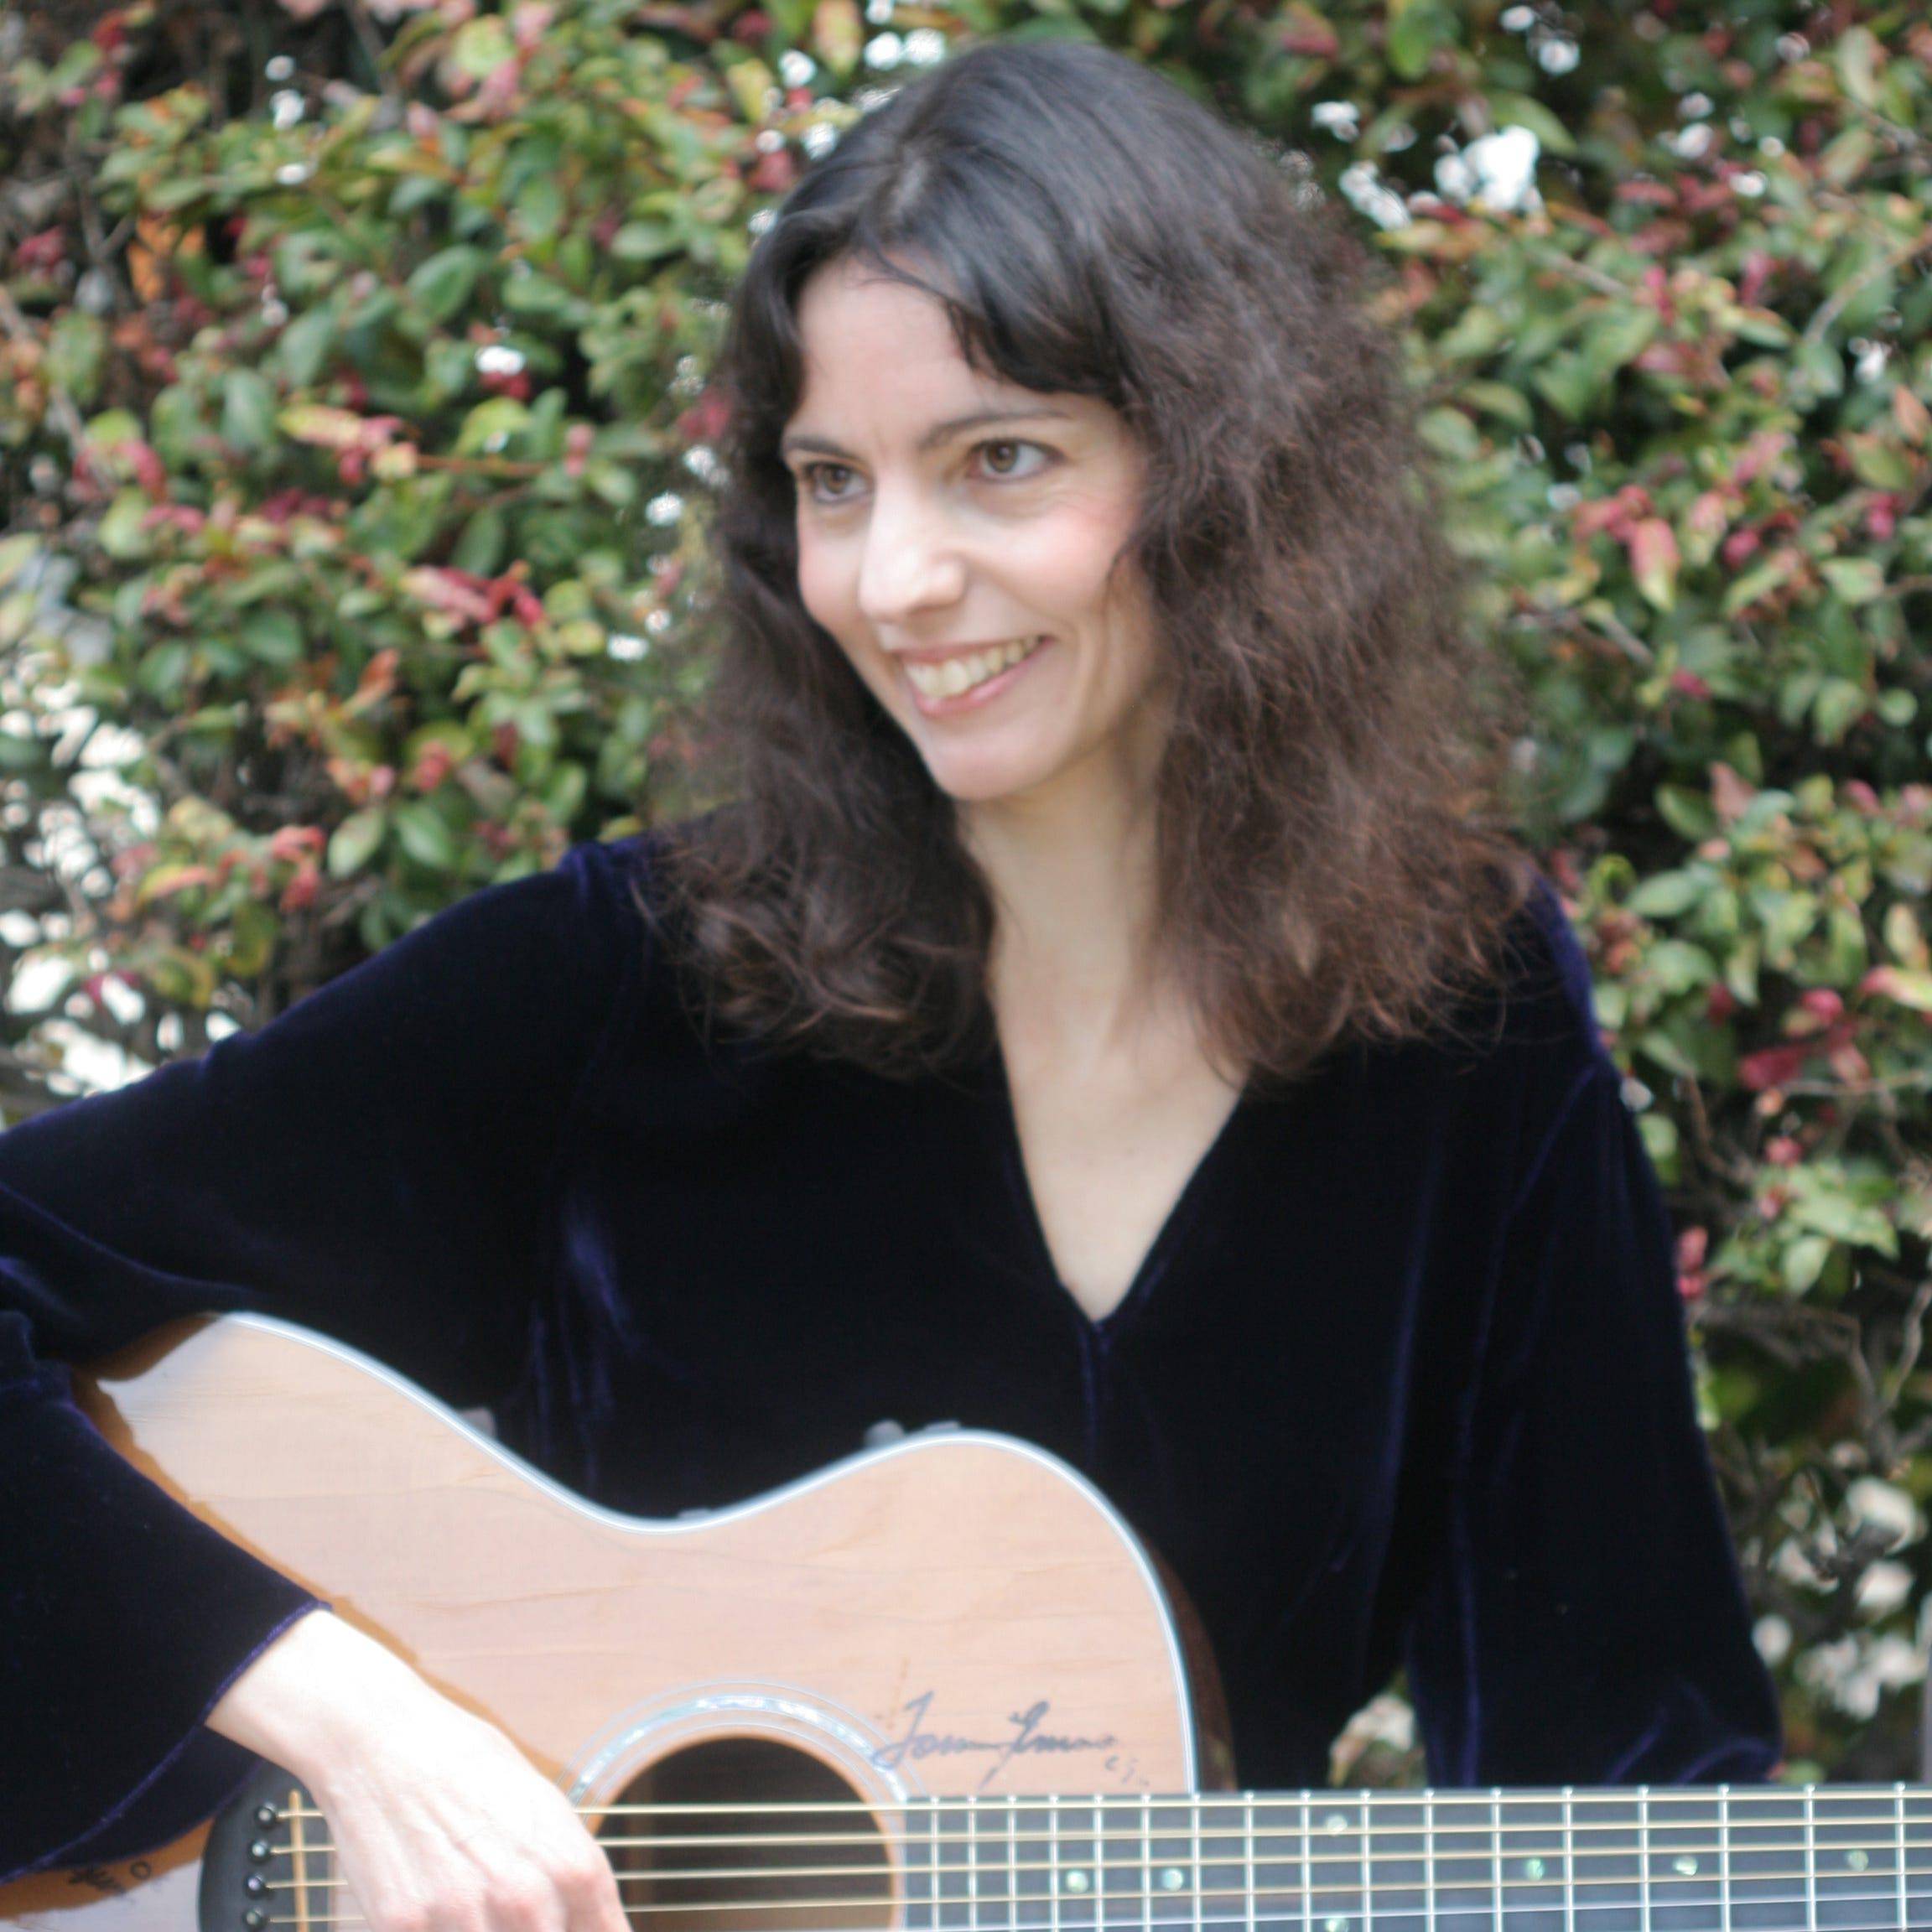 Hudson Valley Folk Guild's annual concert celebrates creative women as its theme